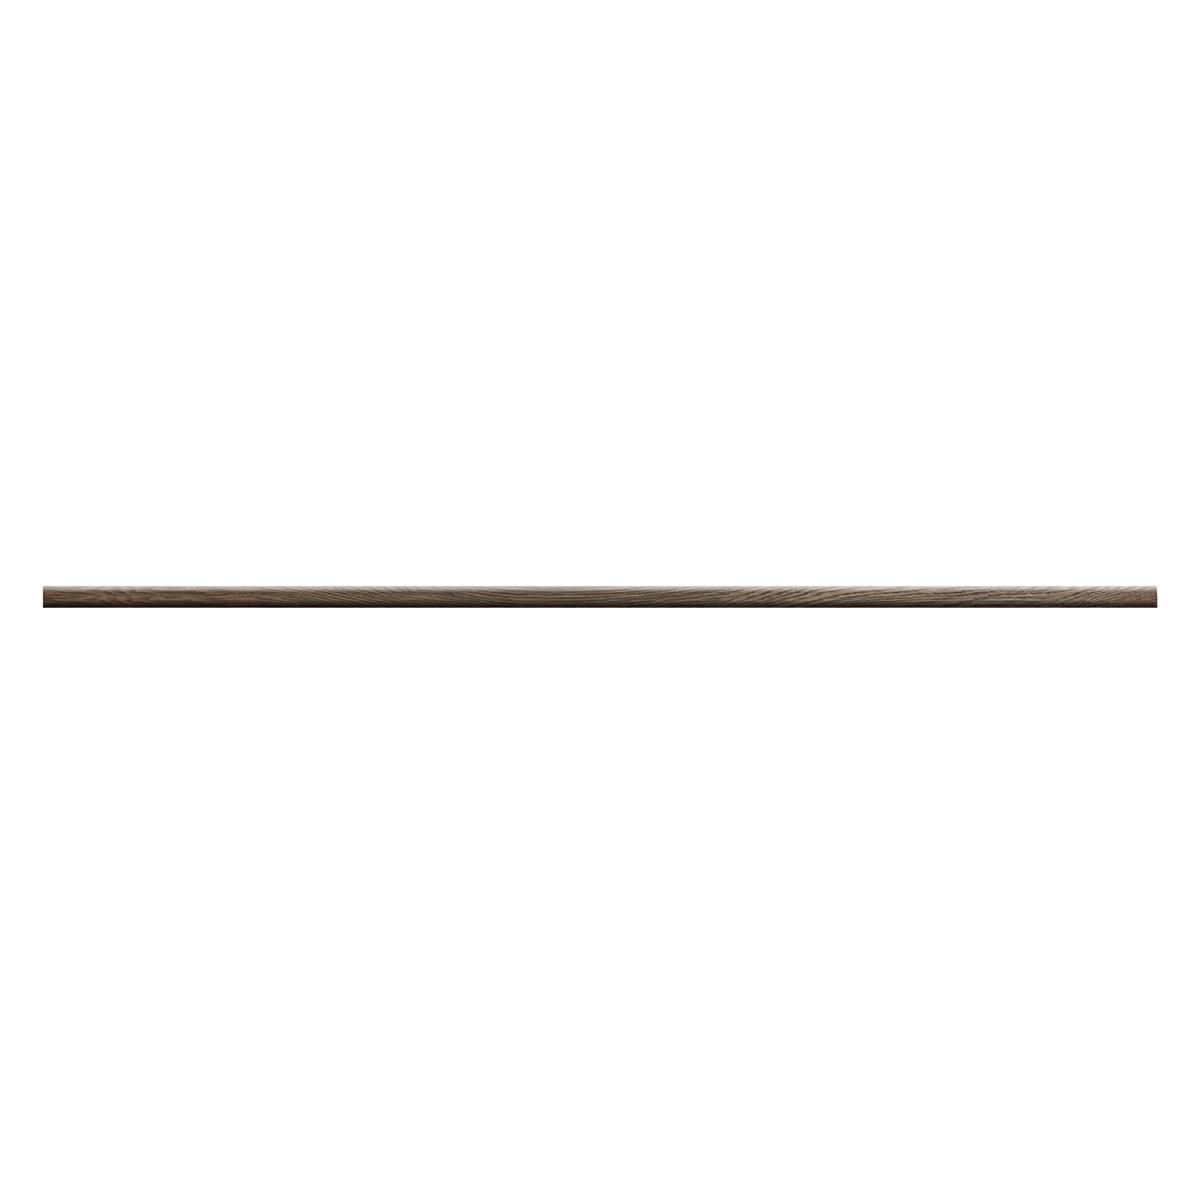 Perfil De Transición Roble Grey Mate - 10X240 cm